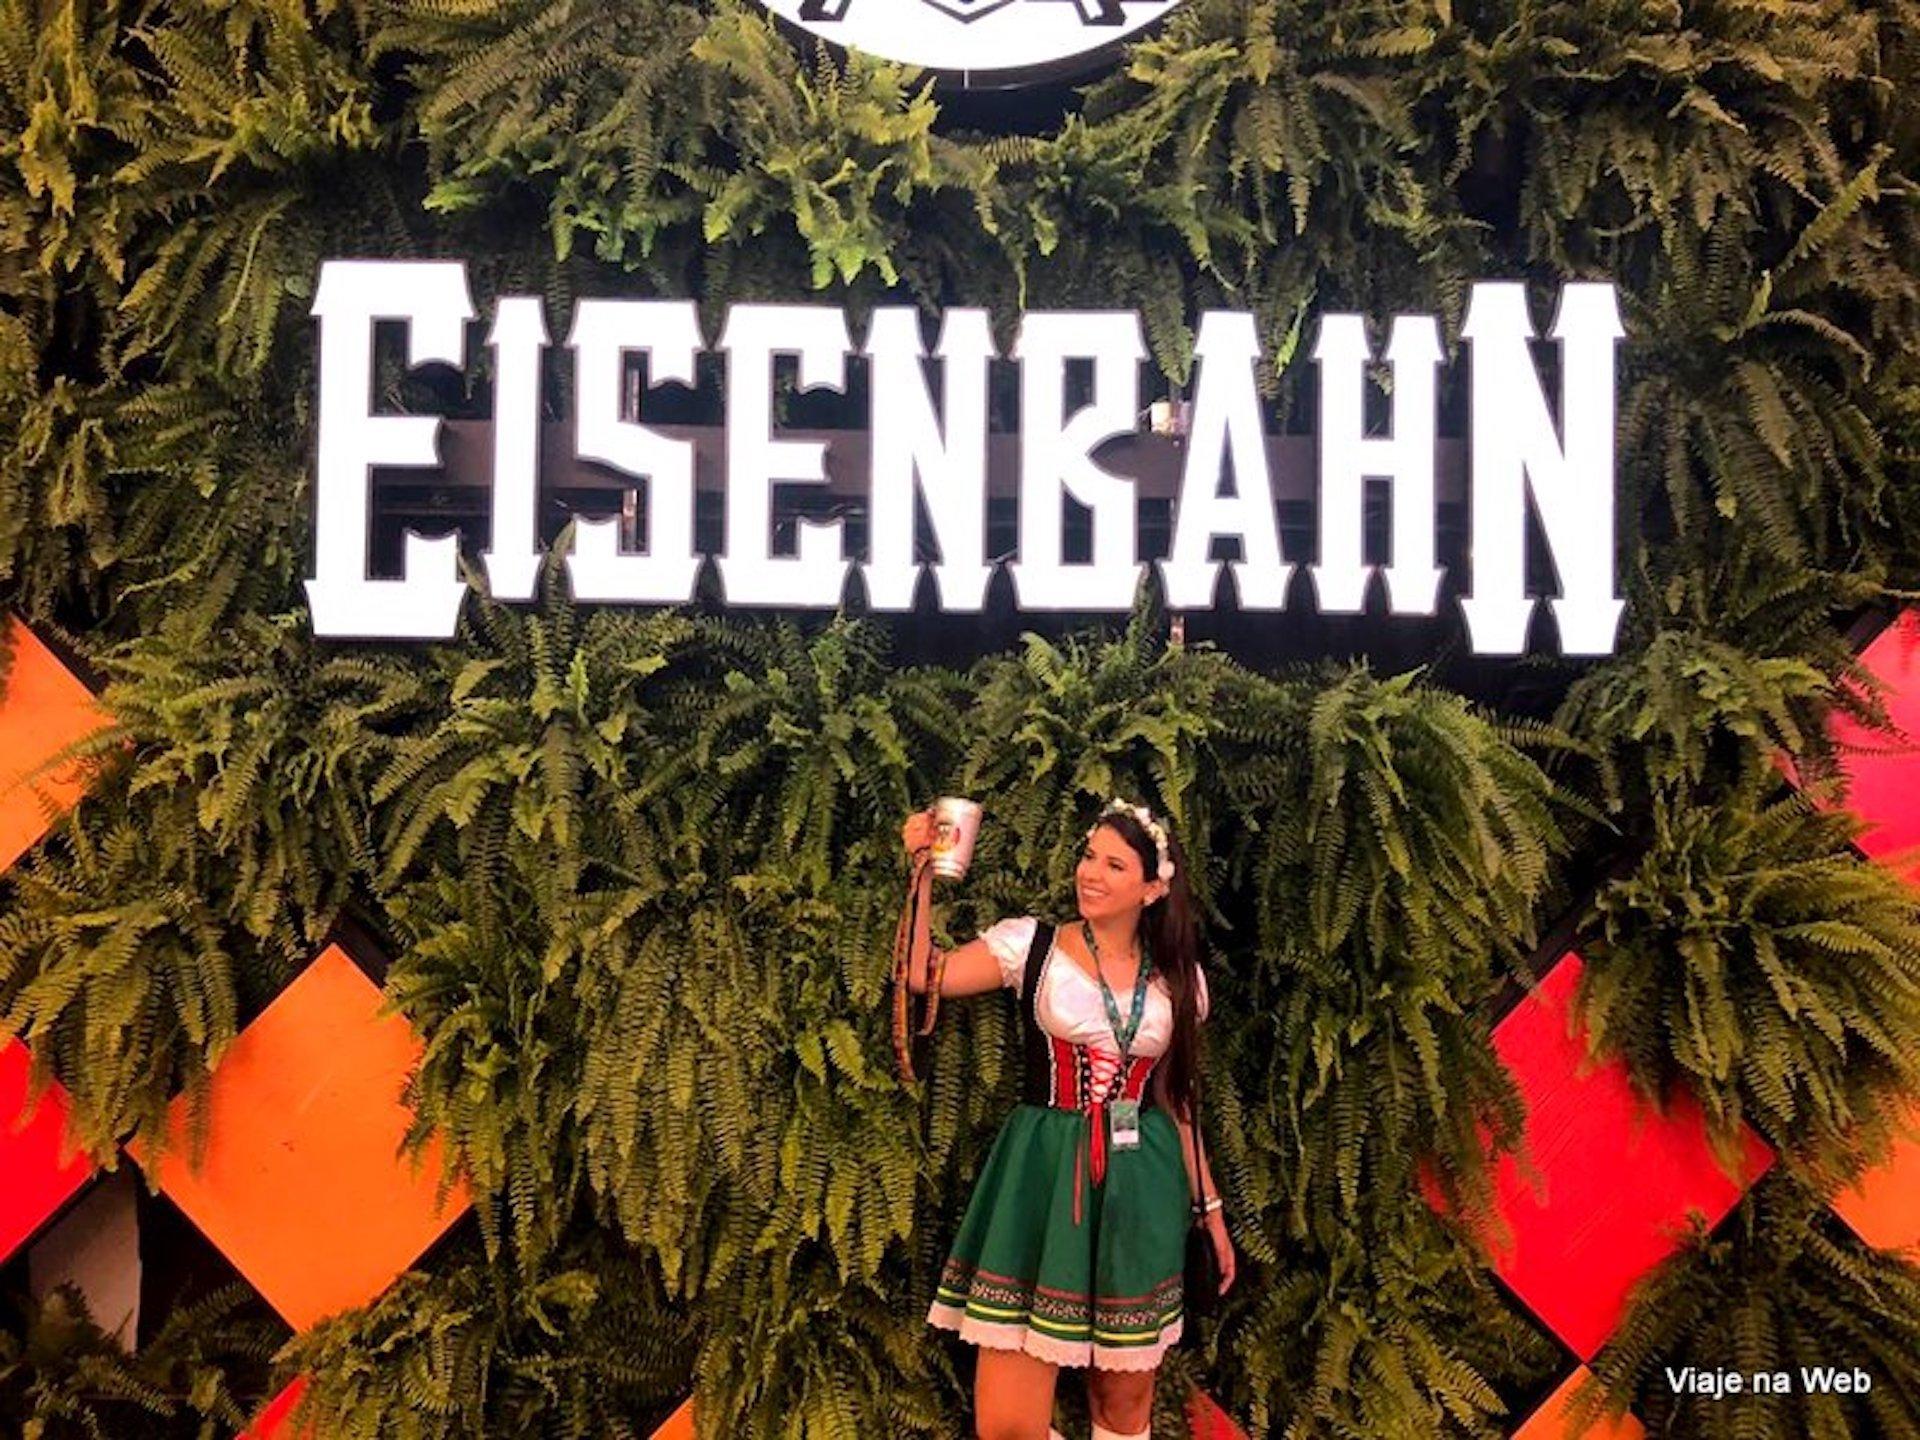 Dicas para Oktoberfest de Blumenau